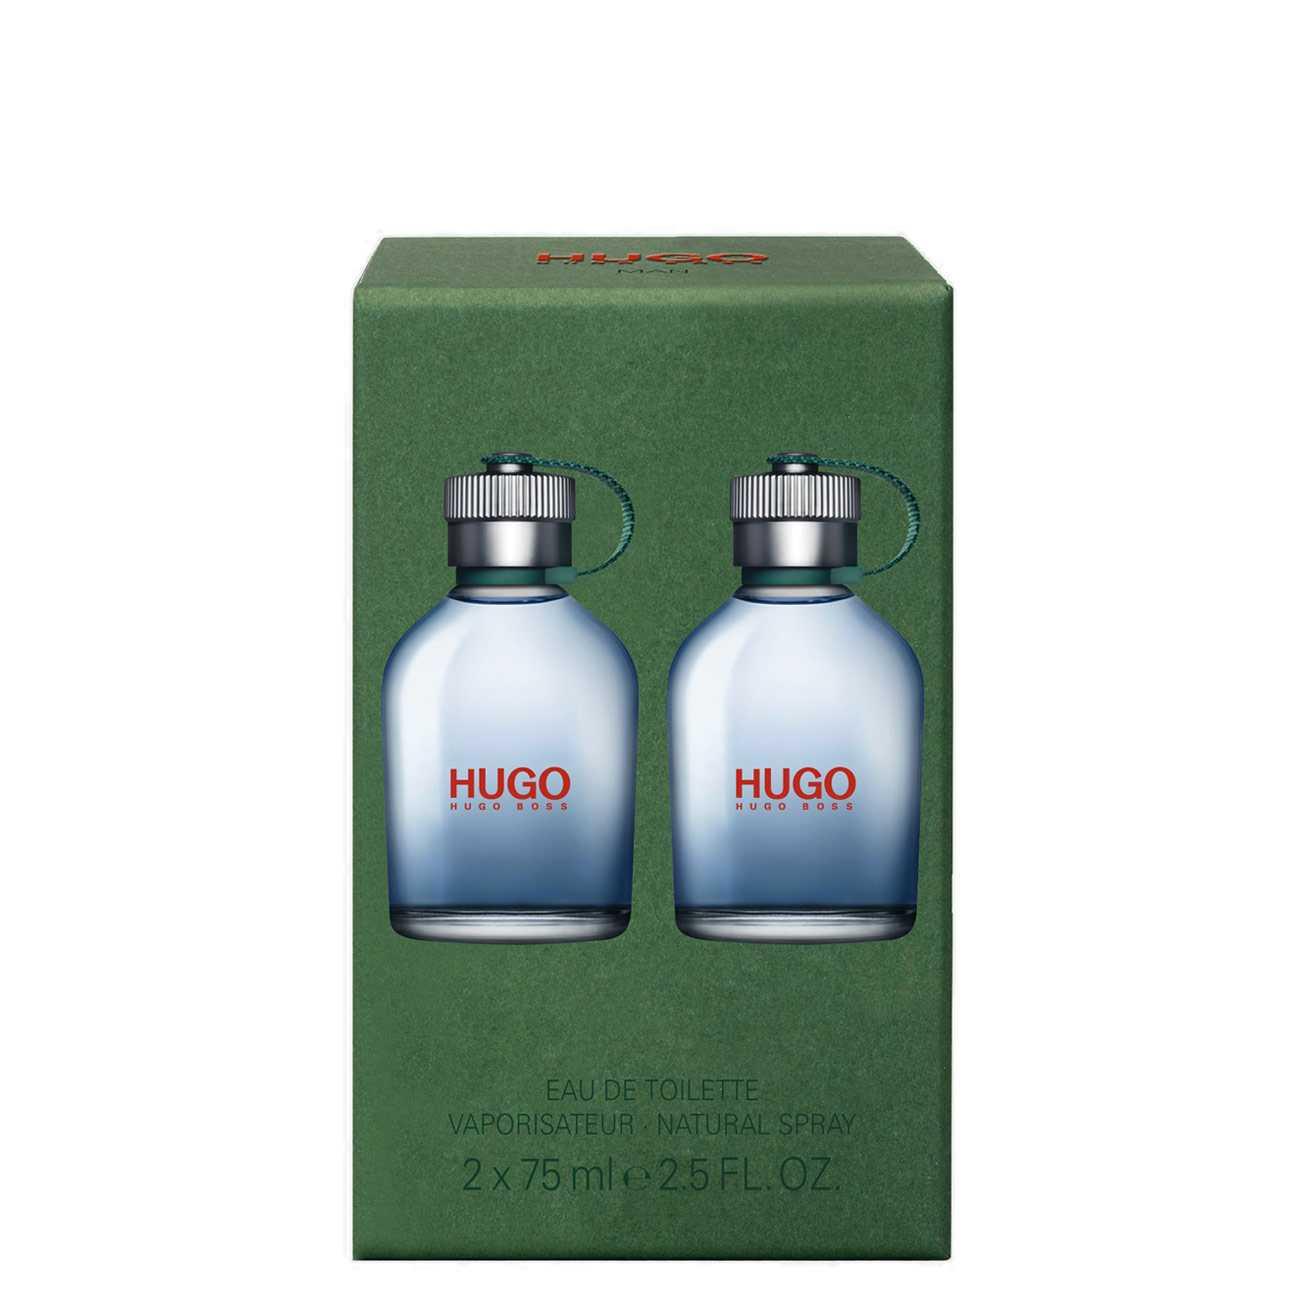 HUGO DUO 150 ML 150ml